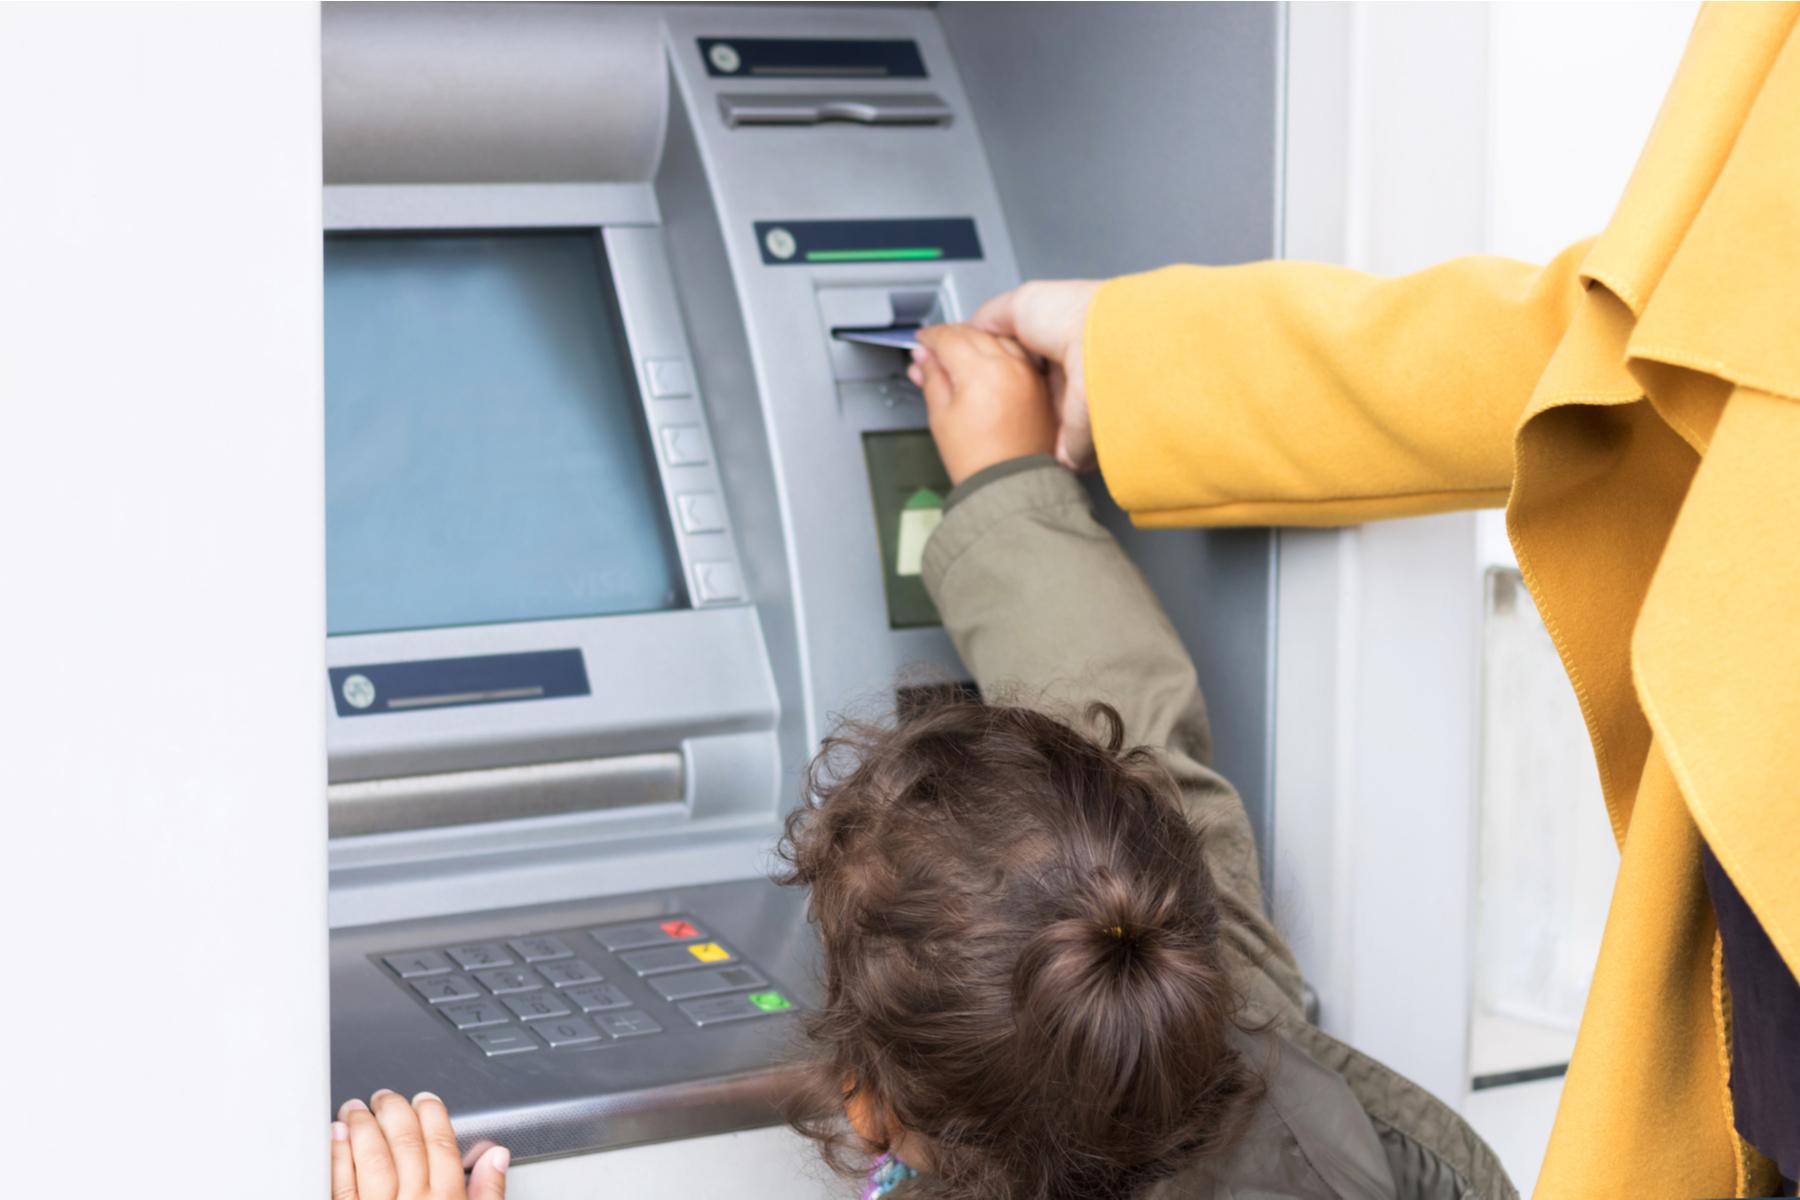 Child using ATM